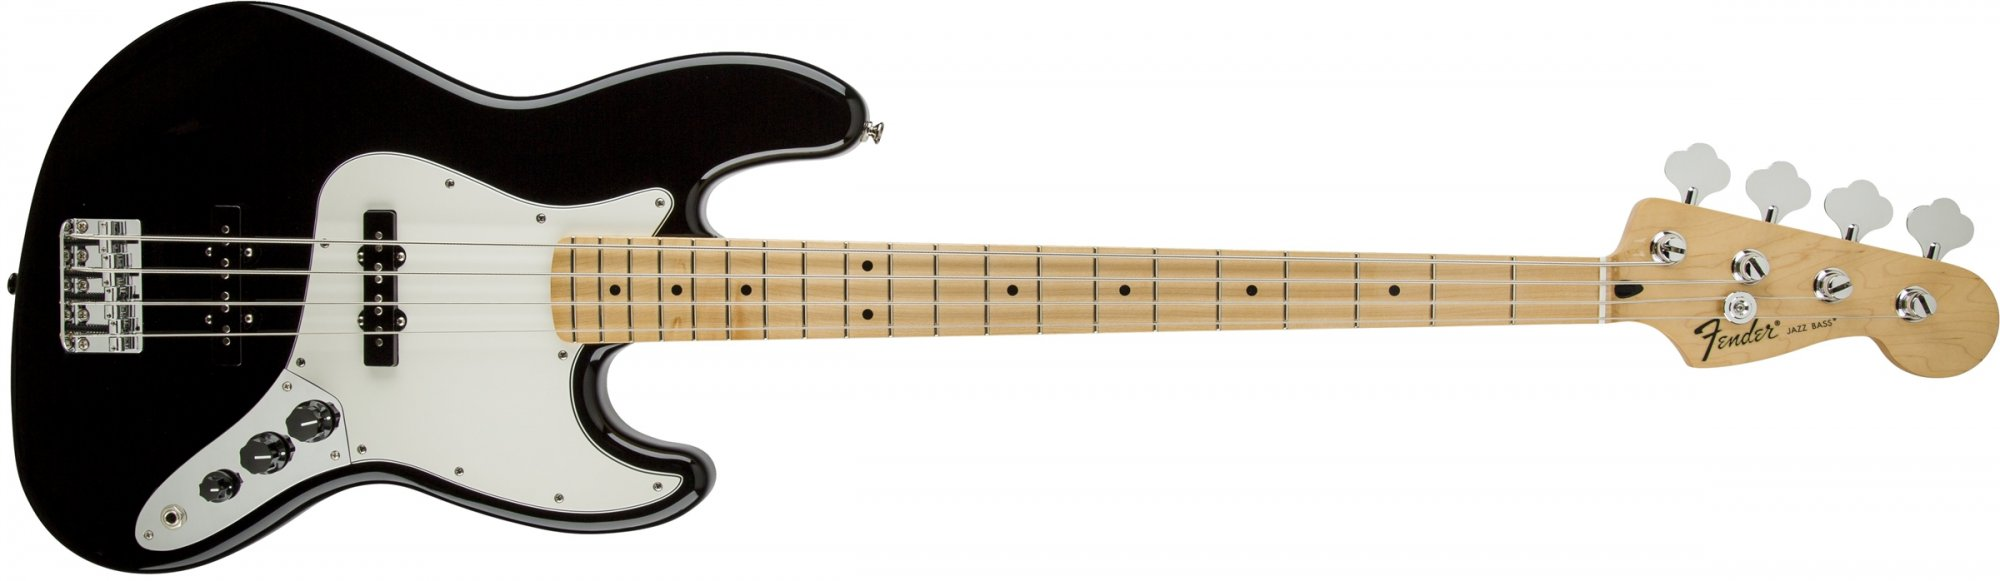 Fender Standard Jazz Bass Guitar Maple Fretboard - Black